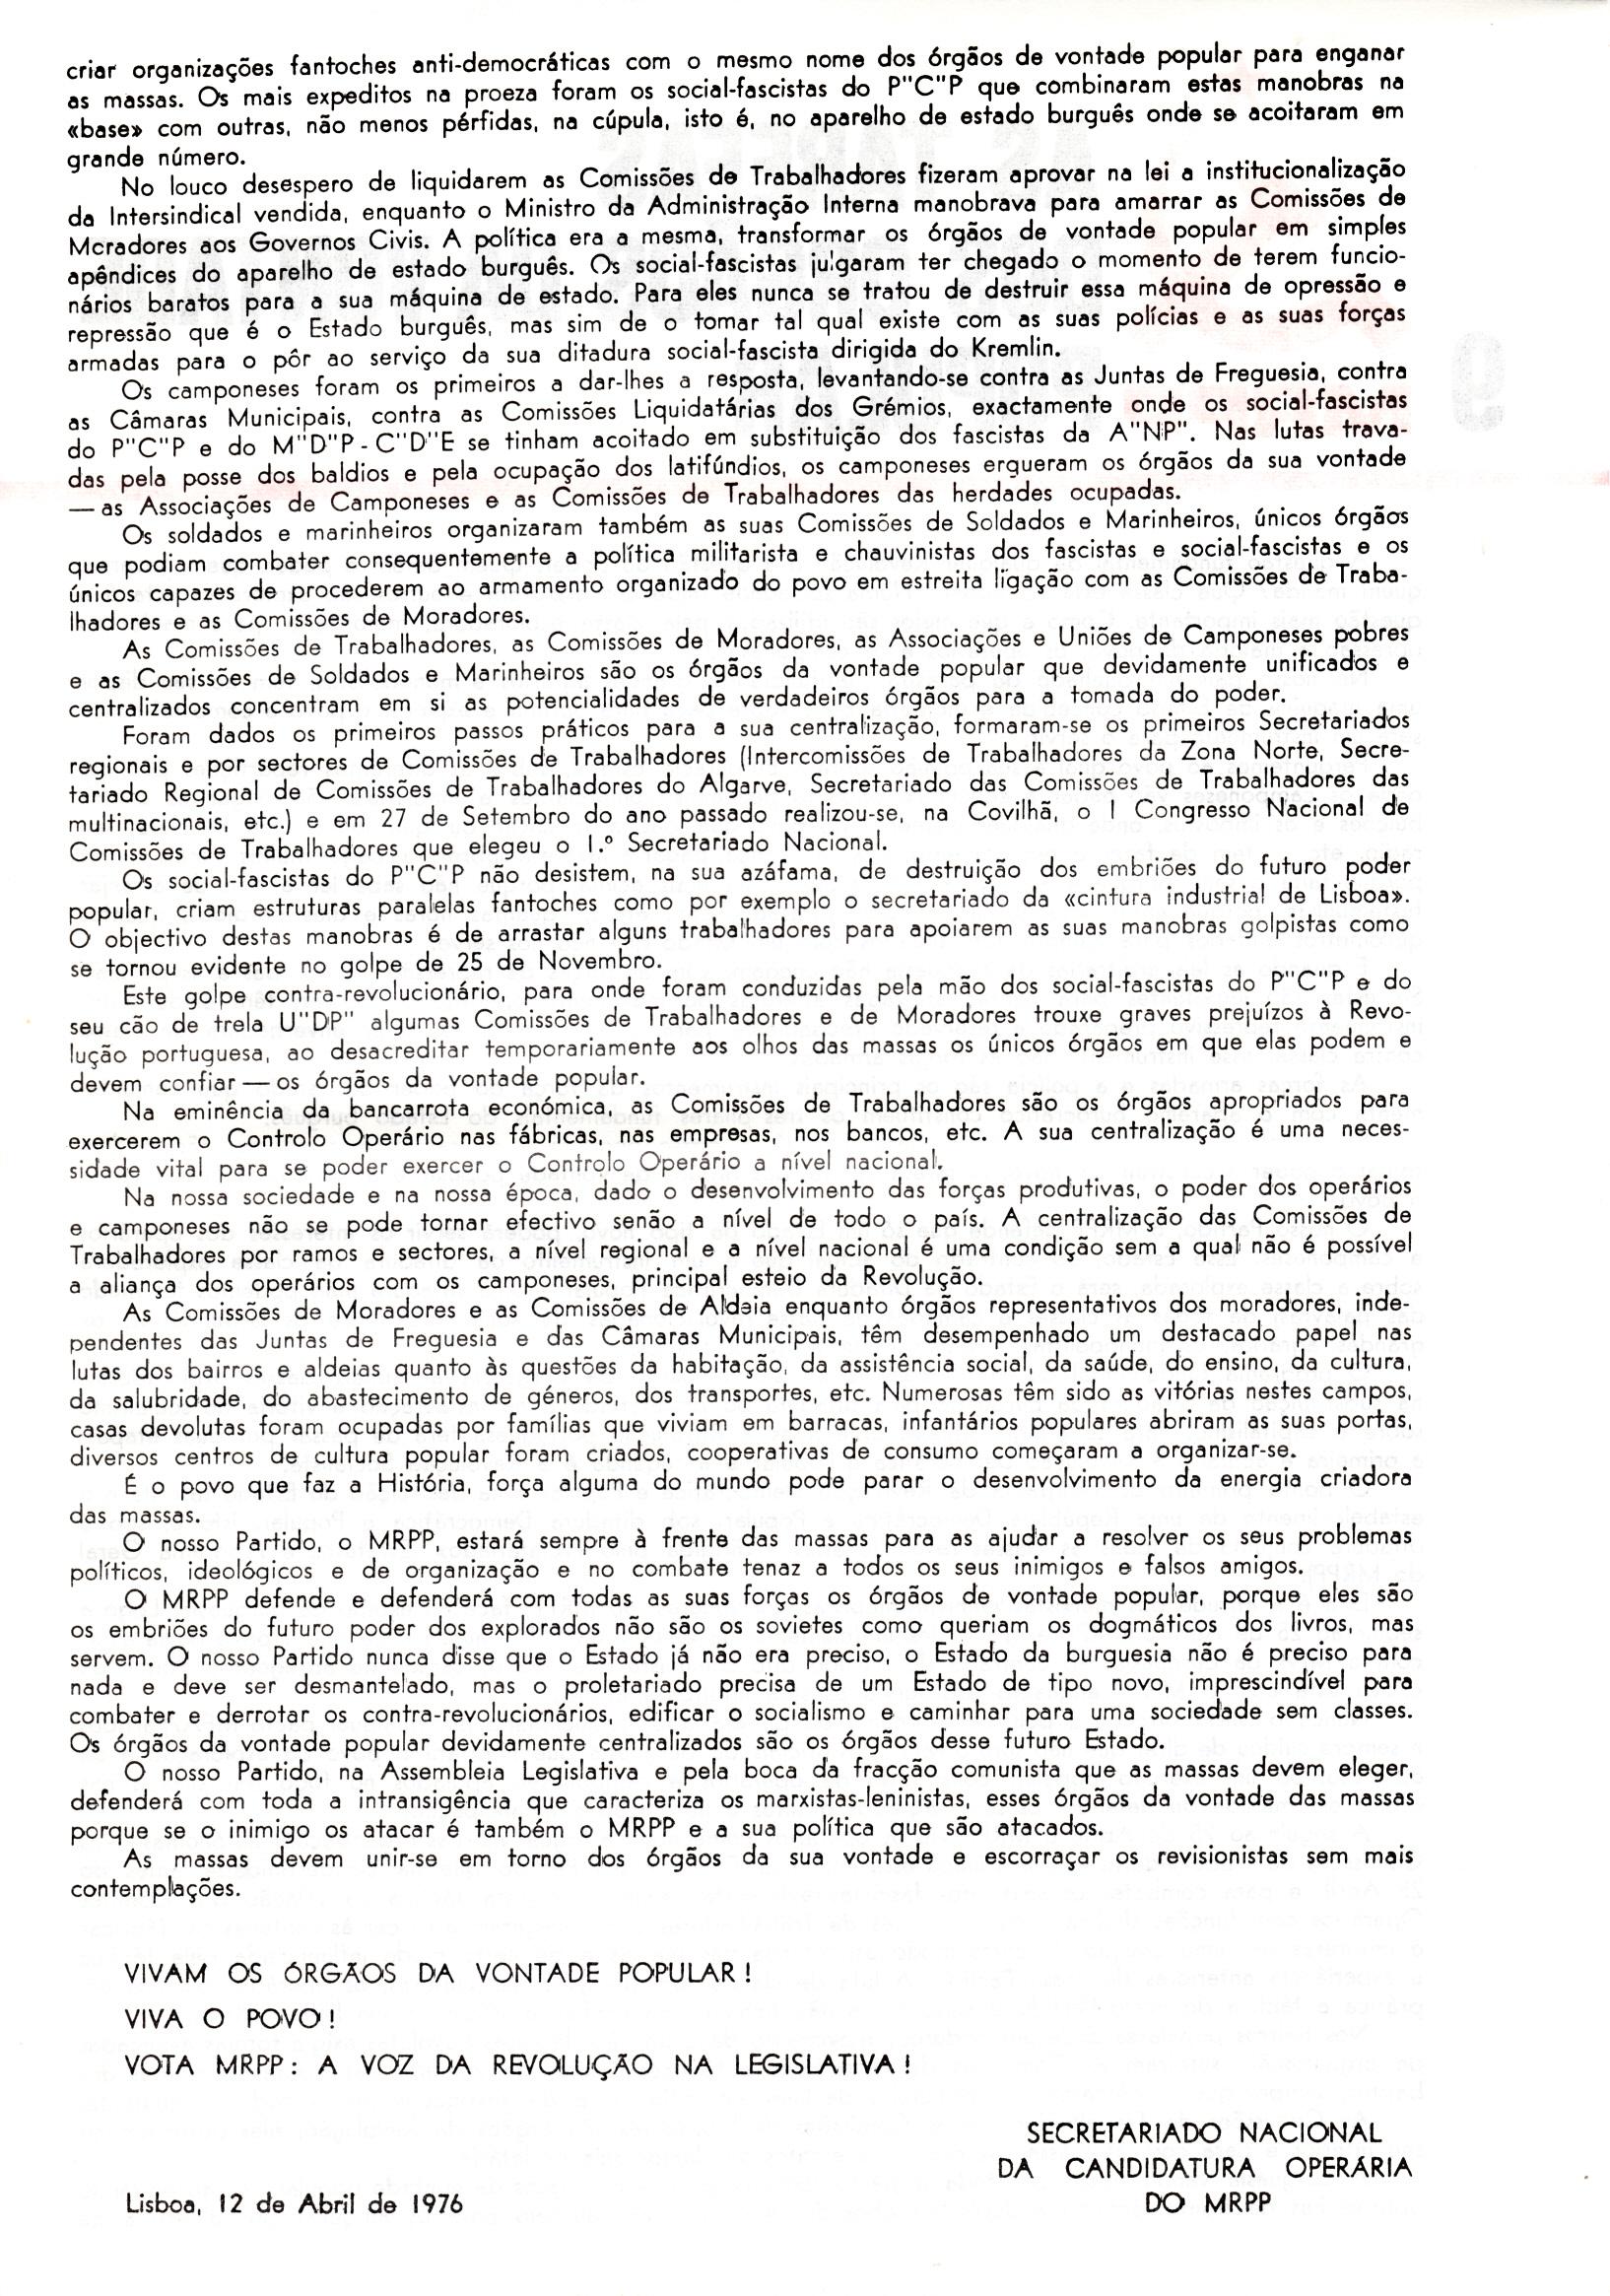 mrpp_1976_eleicao_programa_0018